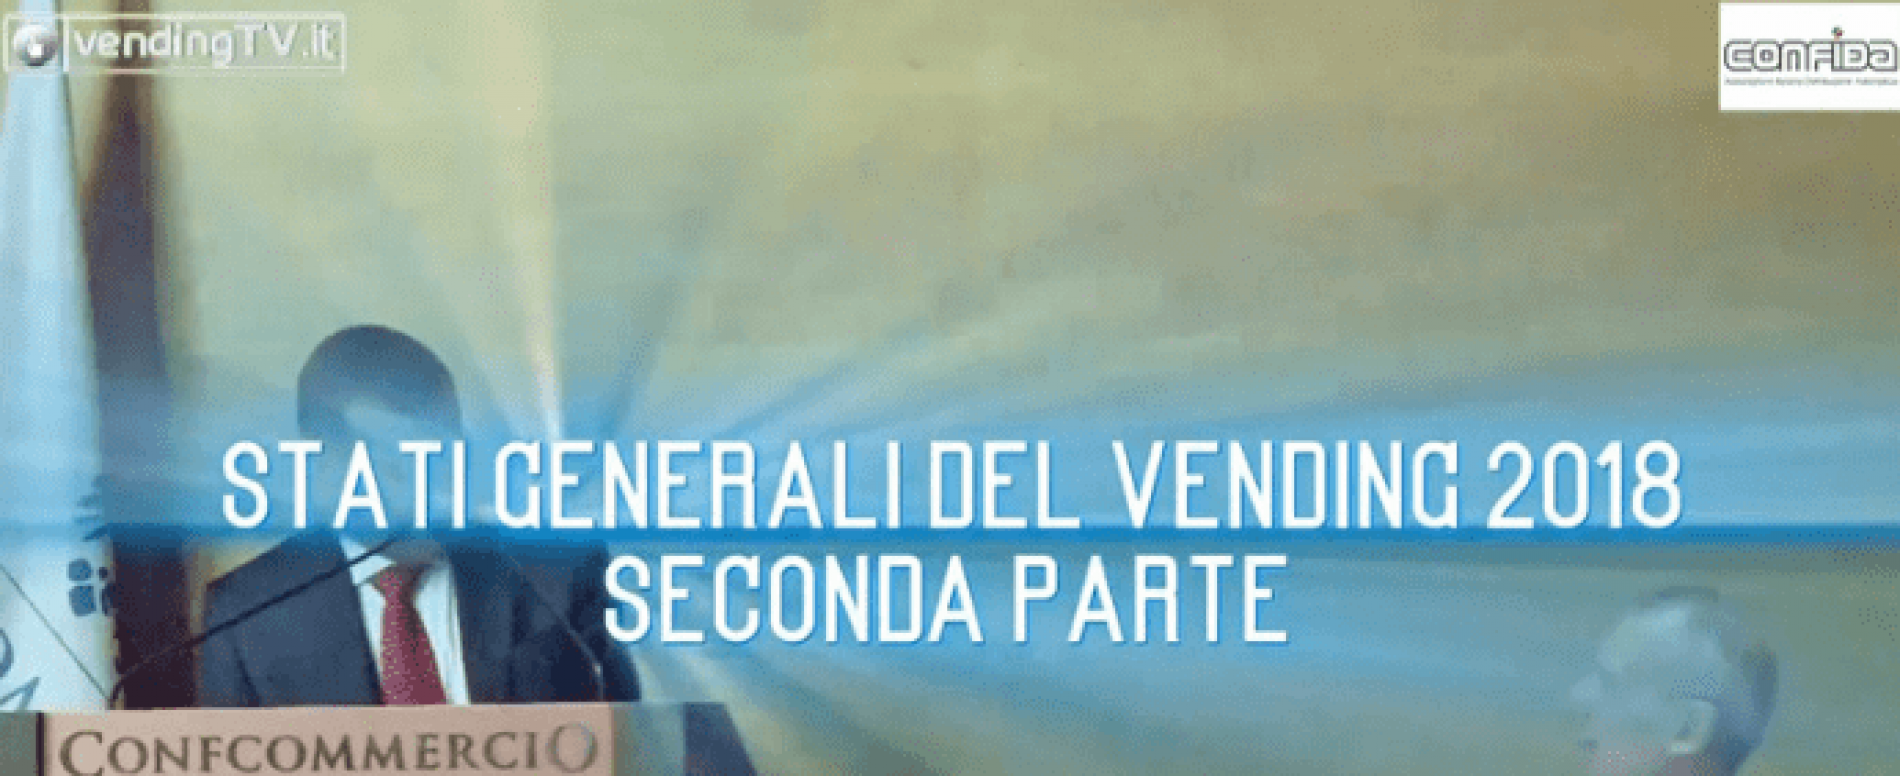 Vending TV. Stati Generali del Vending 2018. Seconda parte